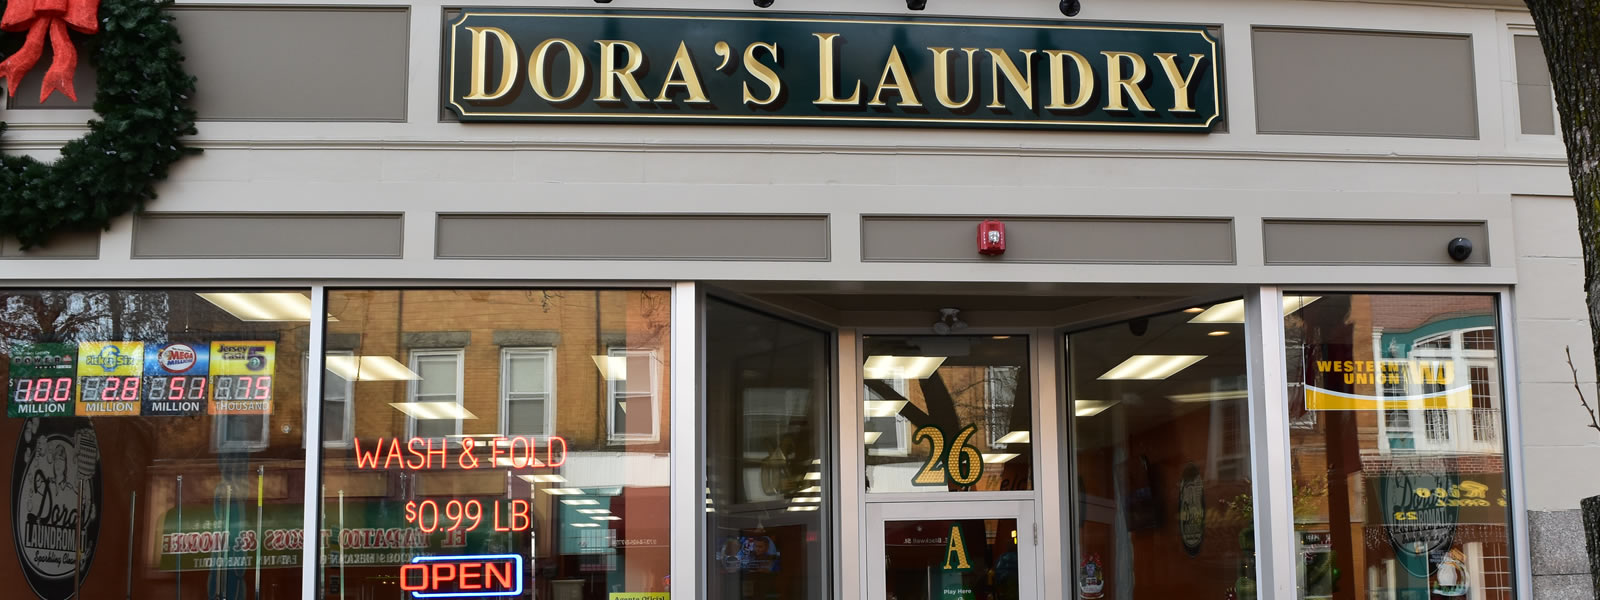 Dora's Laundry Dover NJ